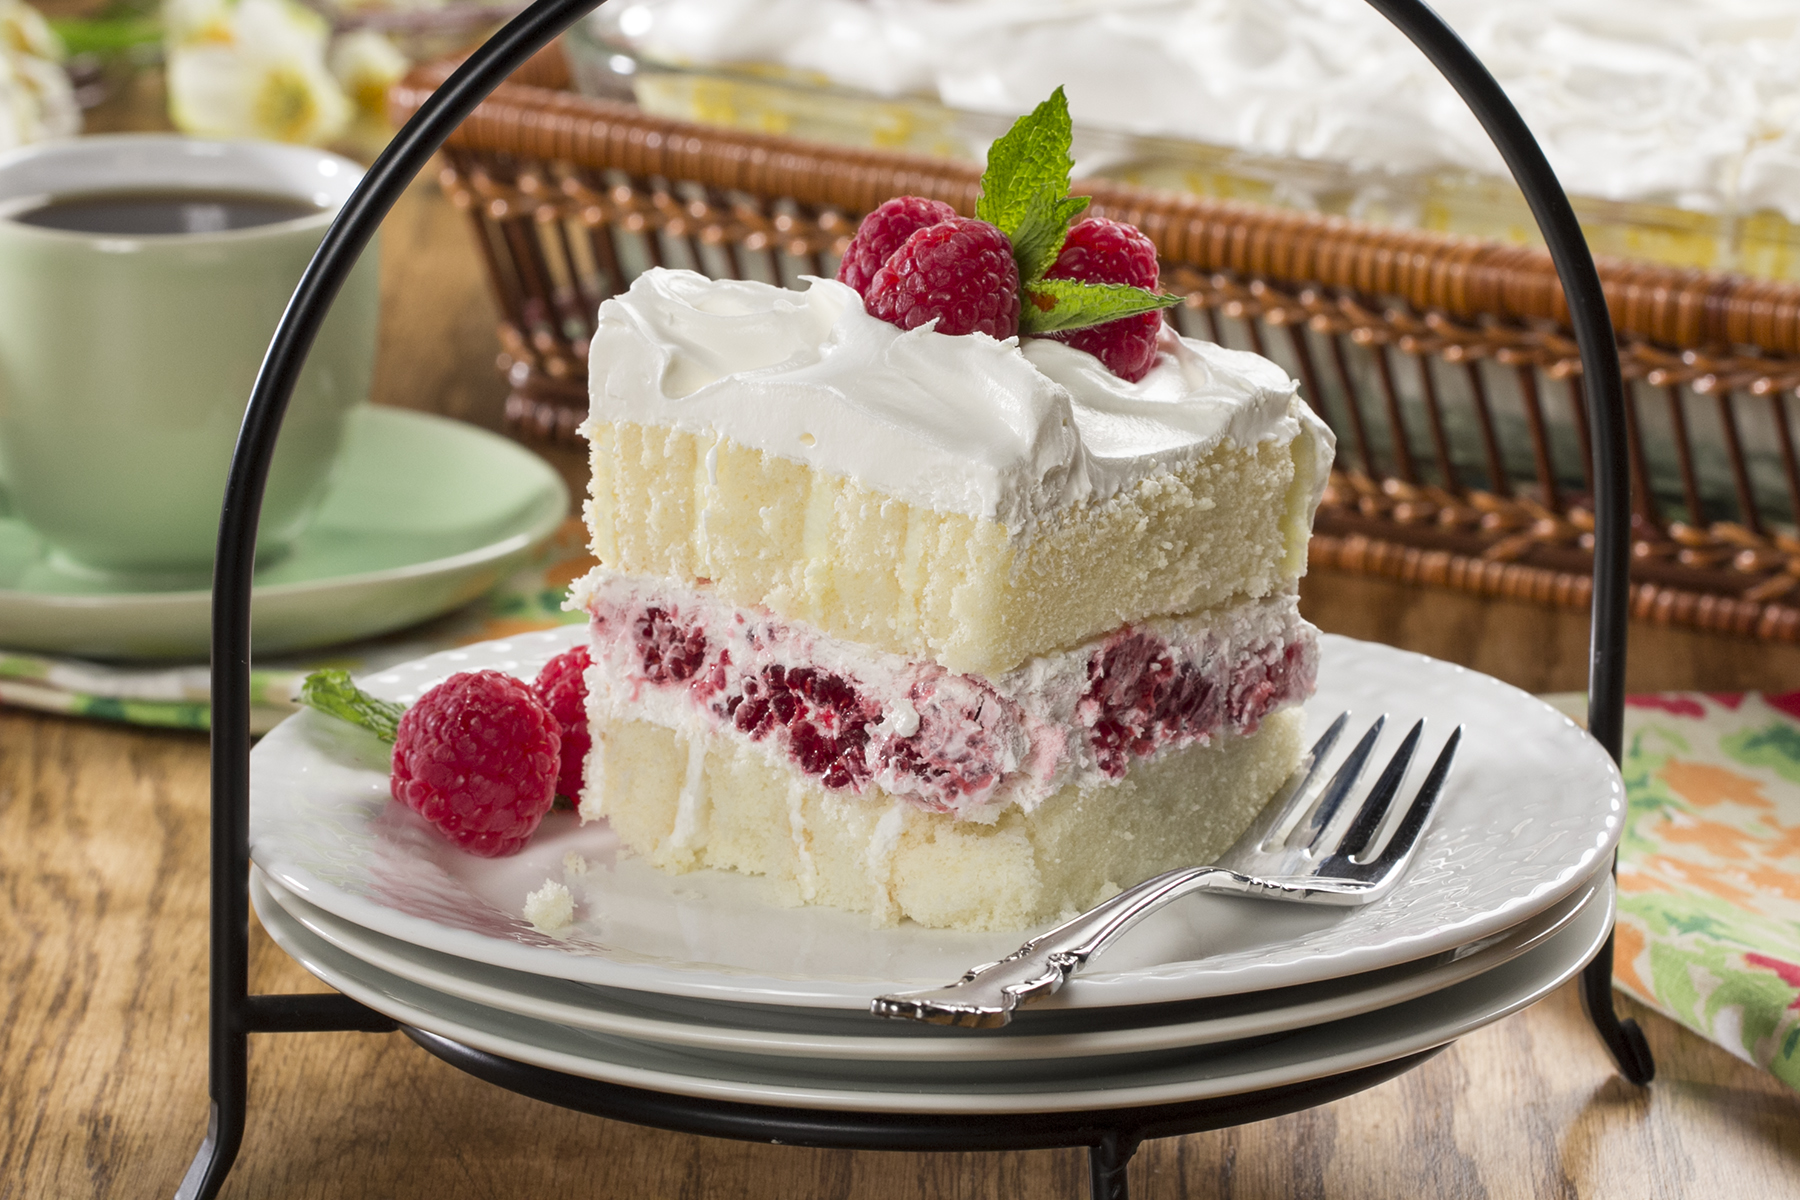 dessert recipes using thick cream 2-2-2-Spring-Fling-Layered-Cake.wmv